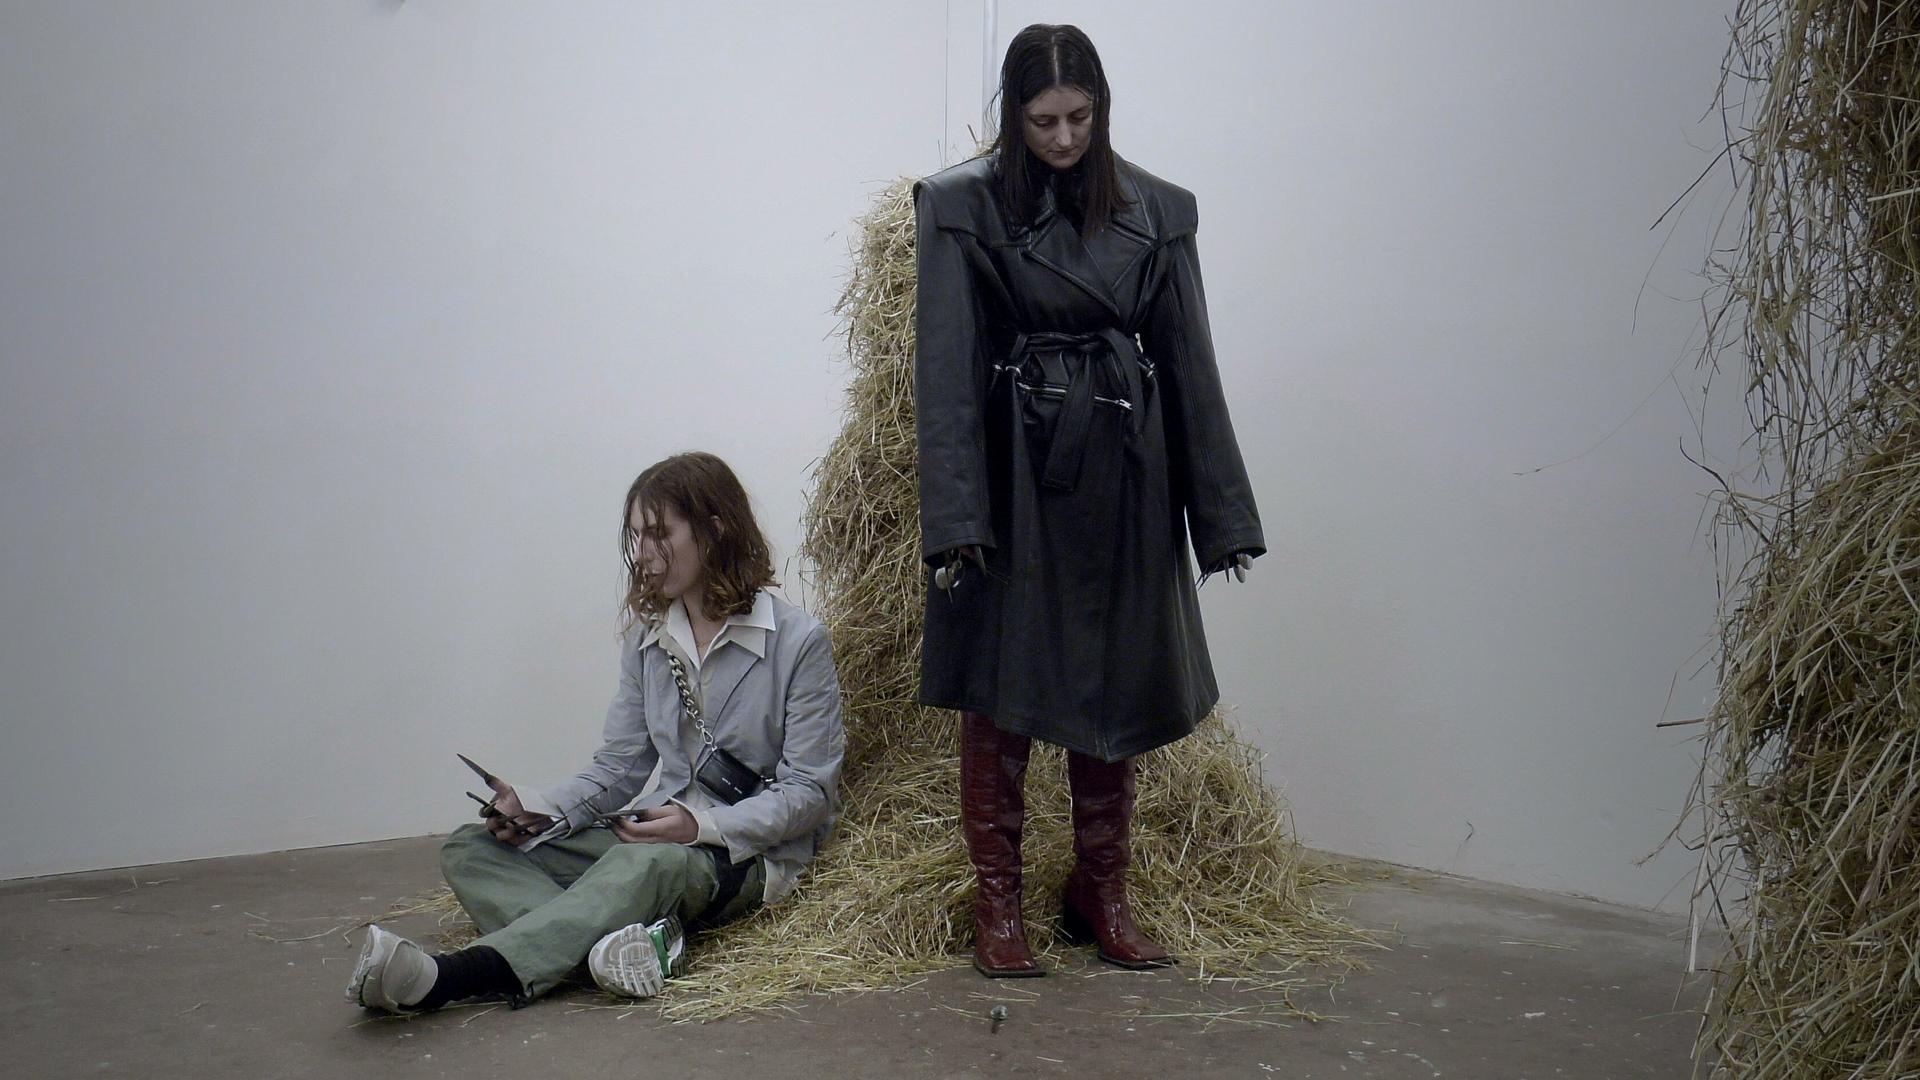 Dorota Gawęda and Eglė Kulbokaitė, Mouthless Part I, 2020. Video, 45:36